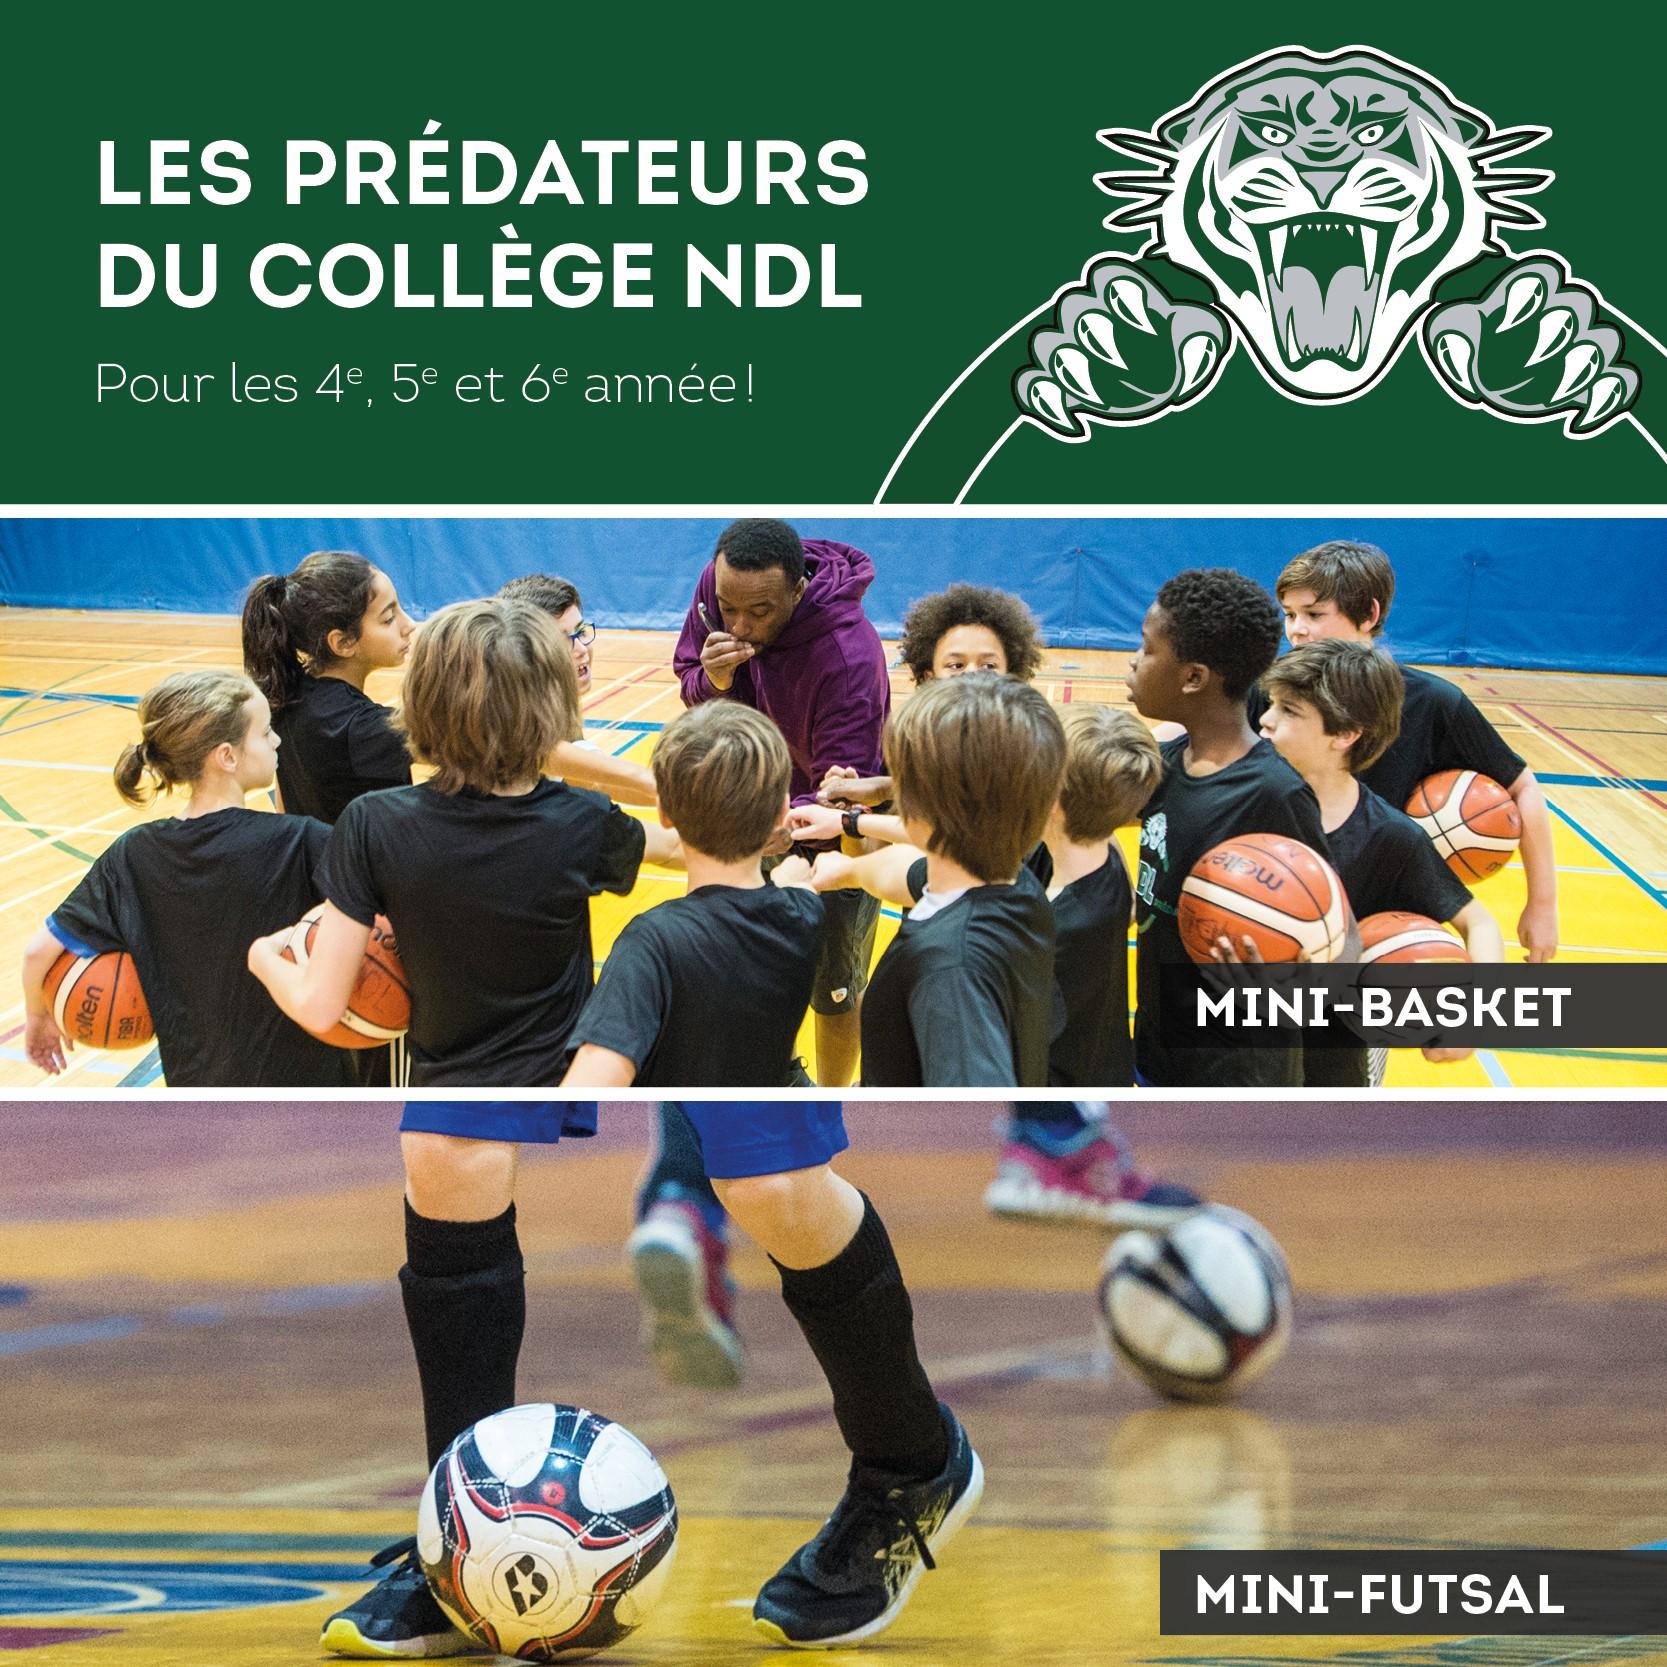 NDL Mini Preds automne 2019